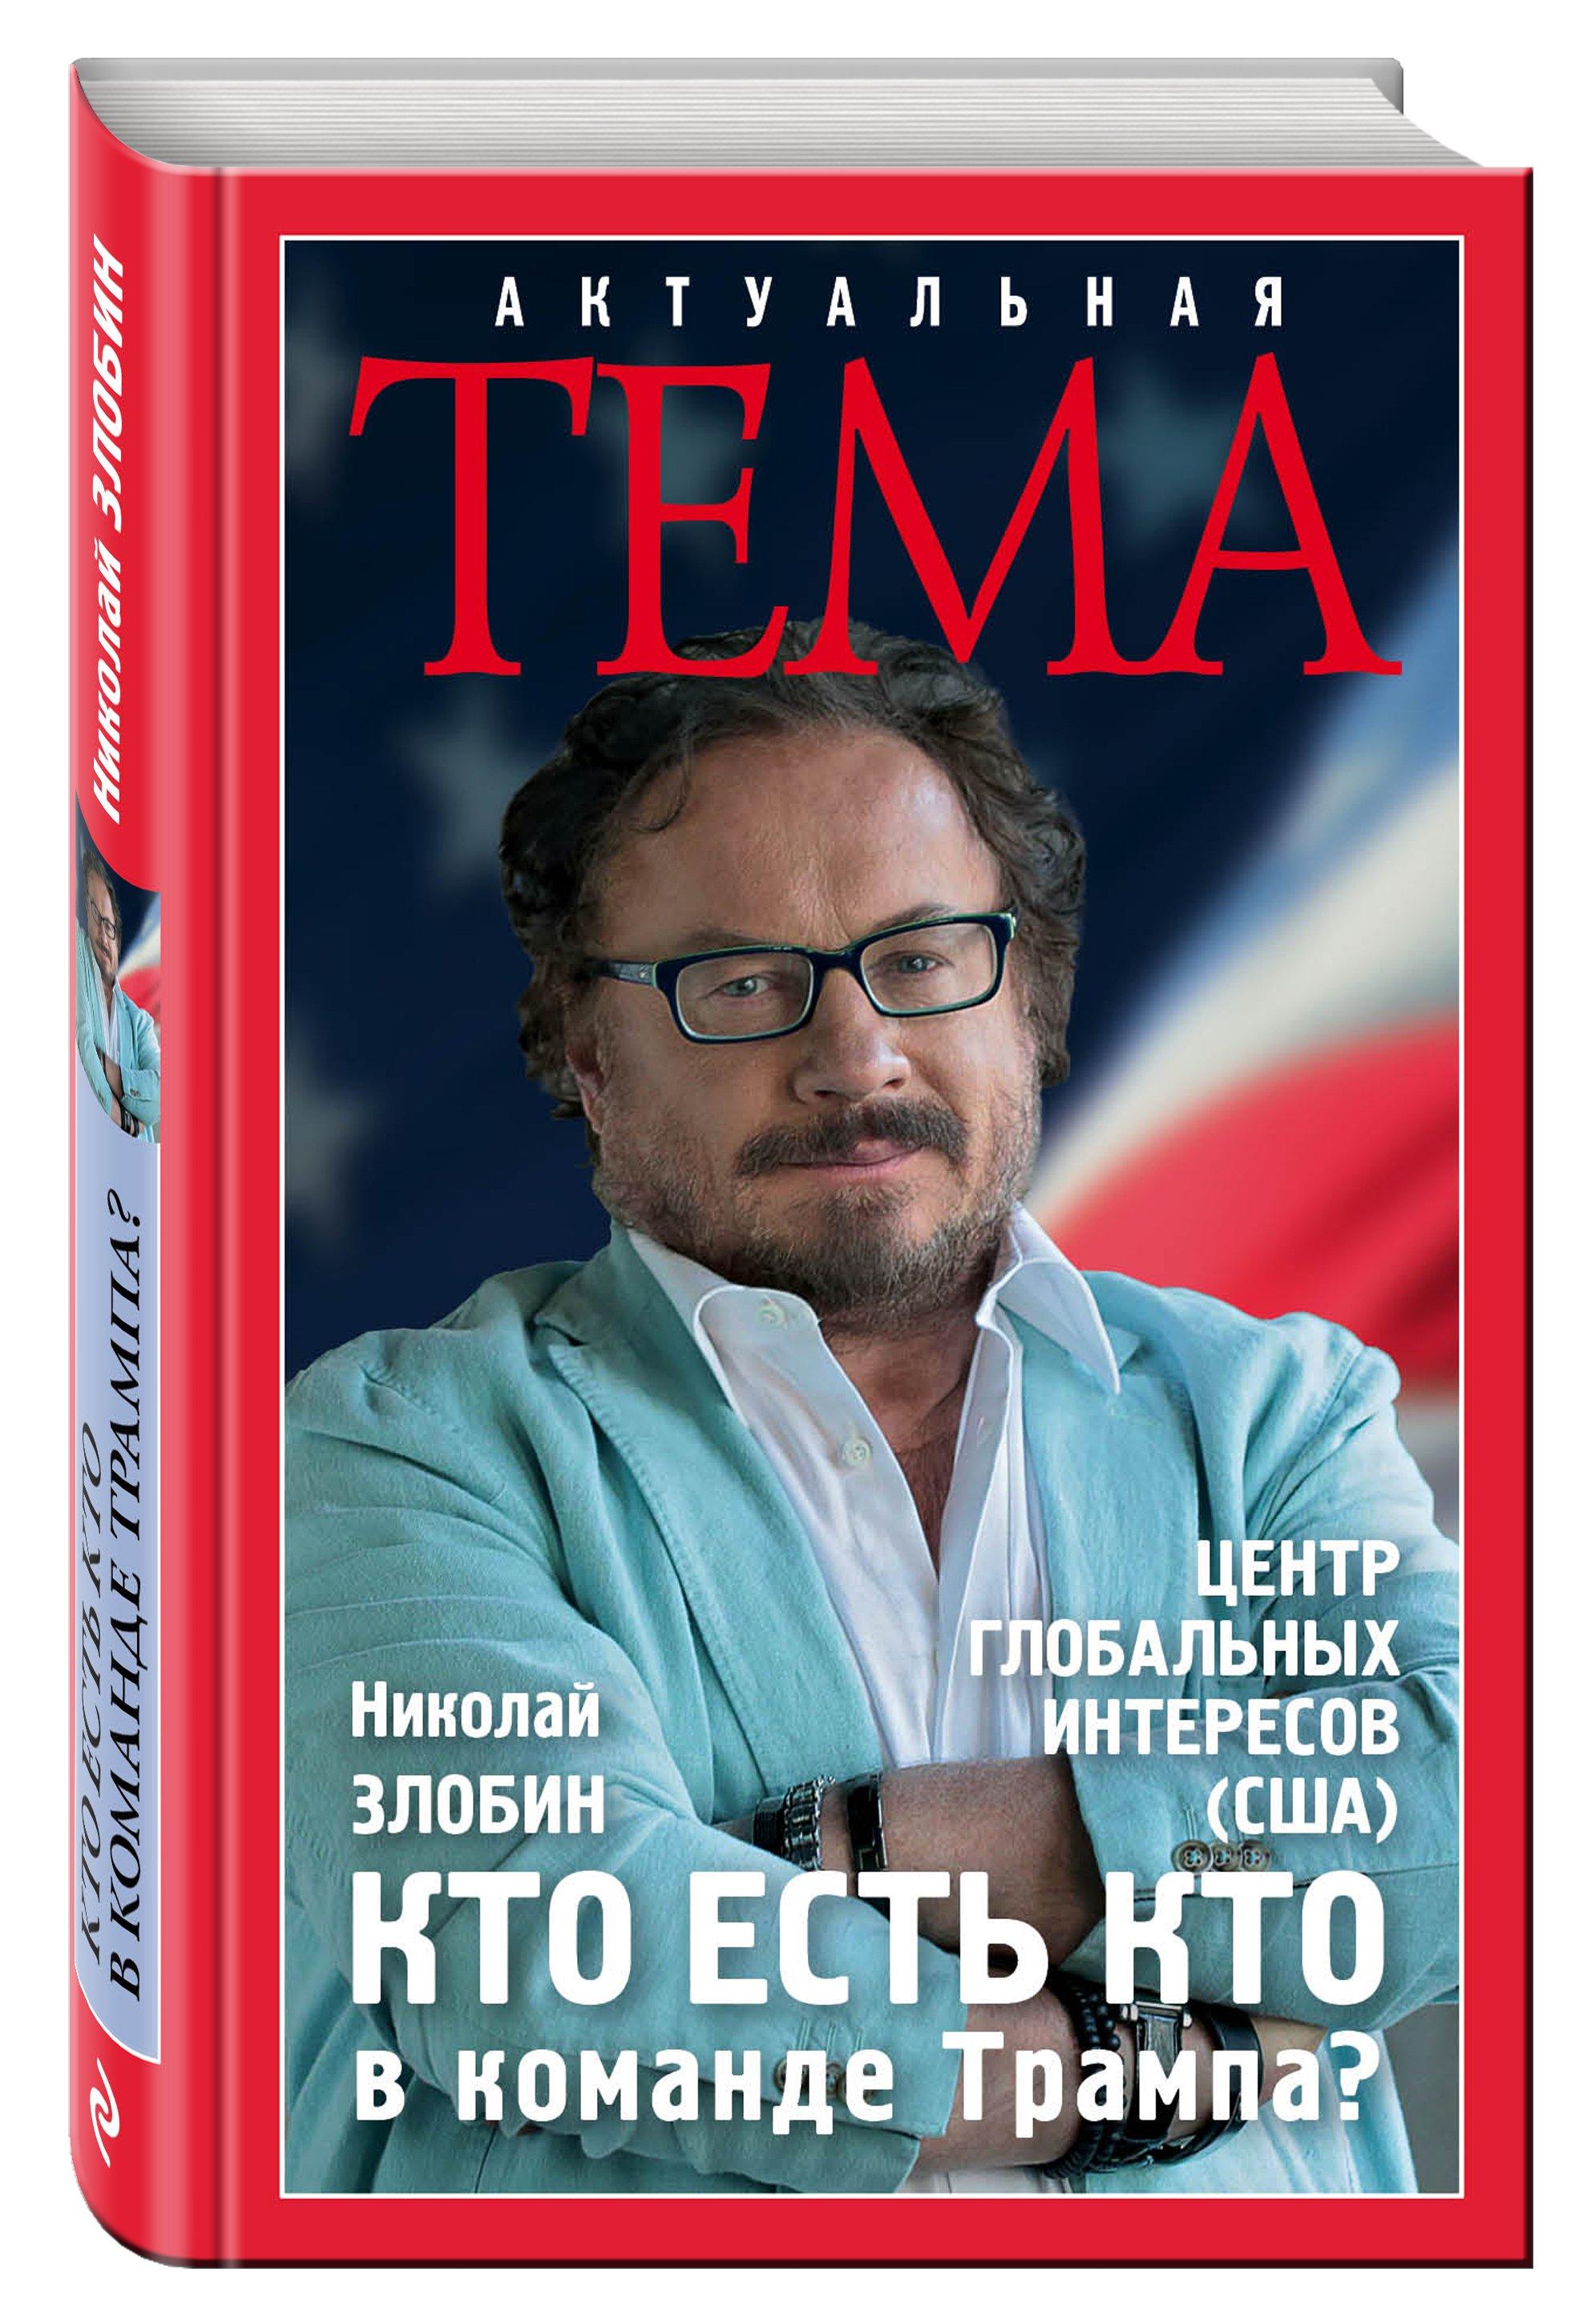 цена на Злобин Николай Васильевич Кто есть кто в команде Трампа?